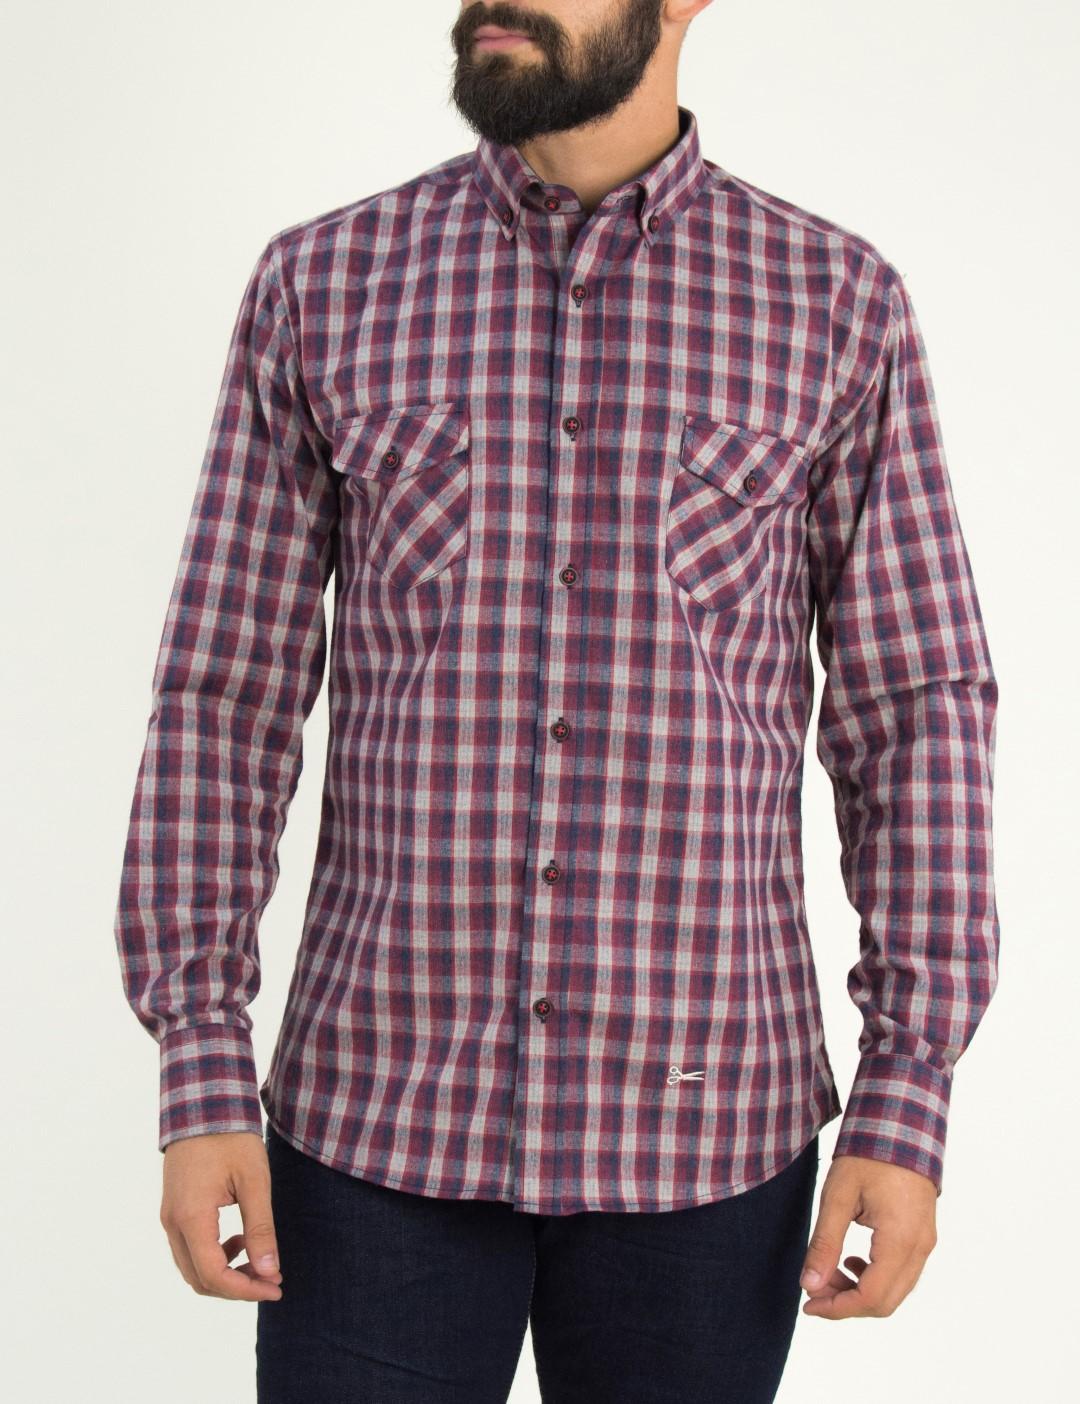 b23f21695215 GrabitApp · Ανδρικό κόκκινο καρό πουκάμισο με τσεπάκια Ben Tailor 0091